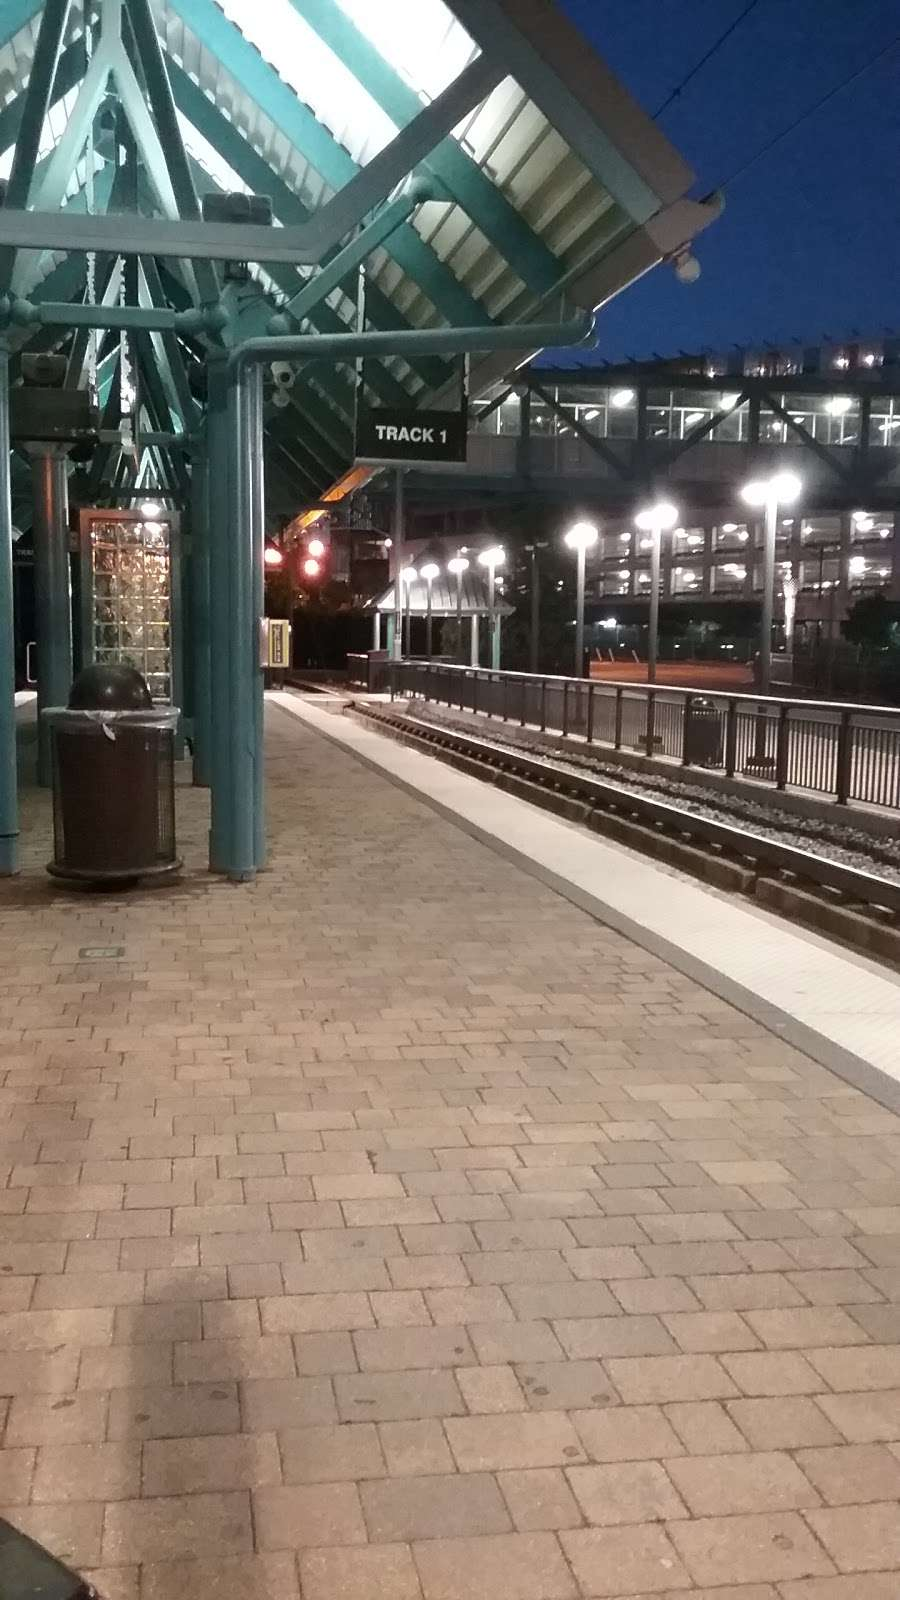 Port Imperial Light Rail Station - bus station  | Photo 2 of 4 | Address: Weehawken, NJ 07086, USA